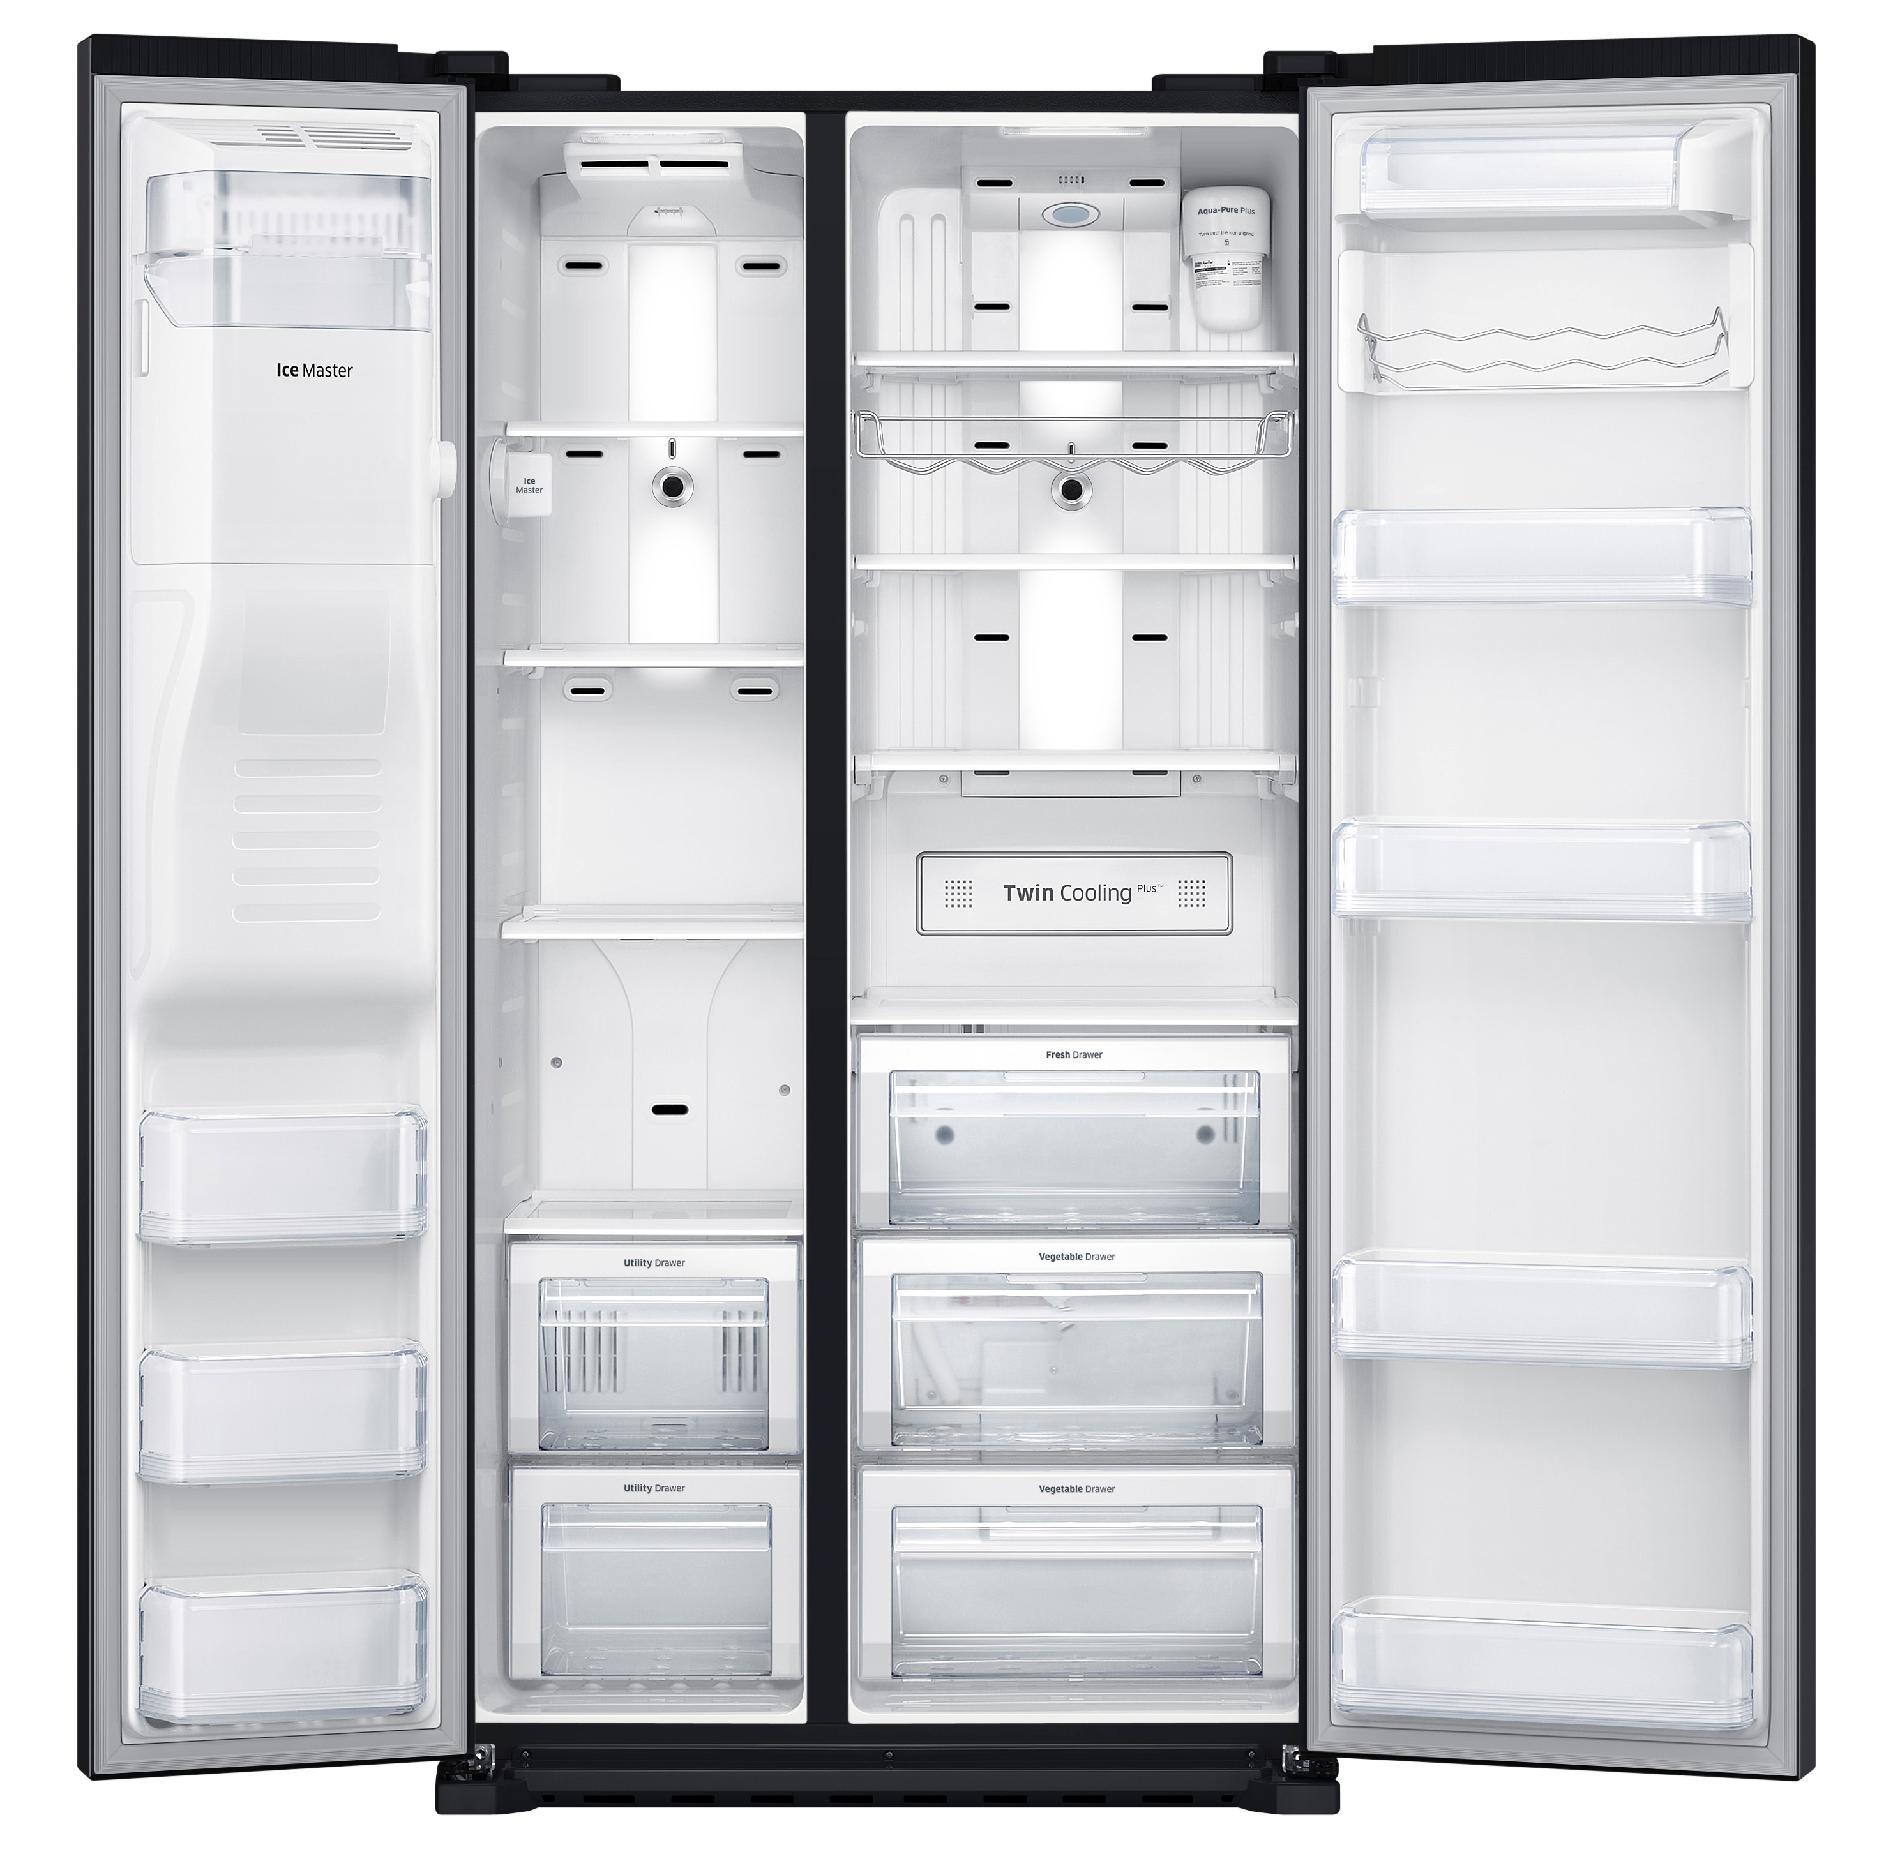 Samsung 22 cu. ft. Counter Depth Side-by-Side Refrigerator - Black